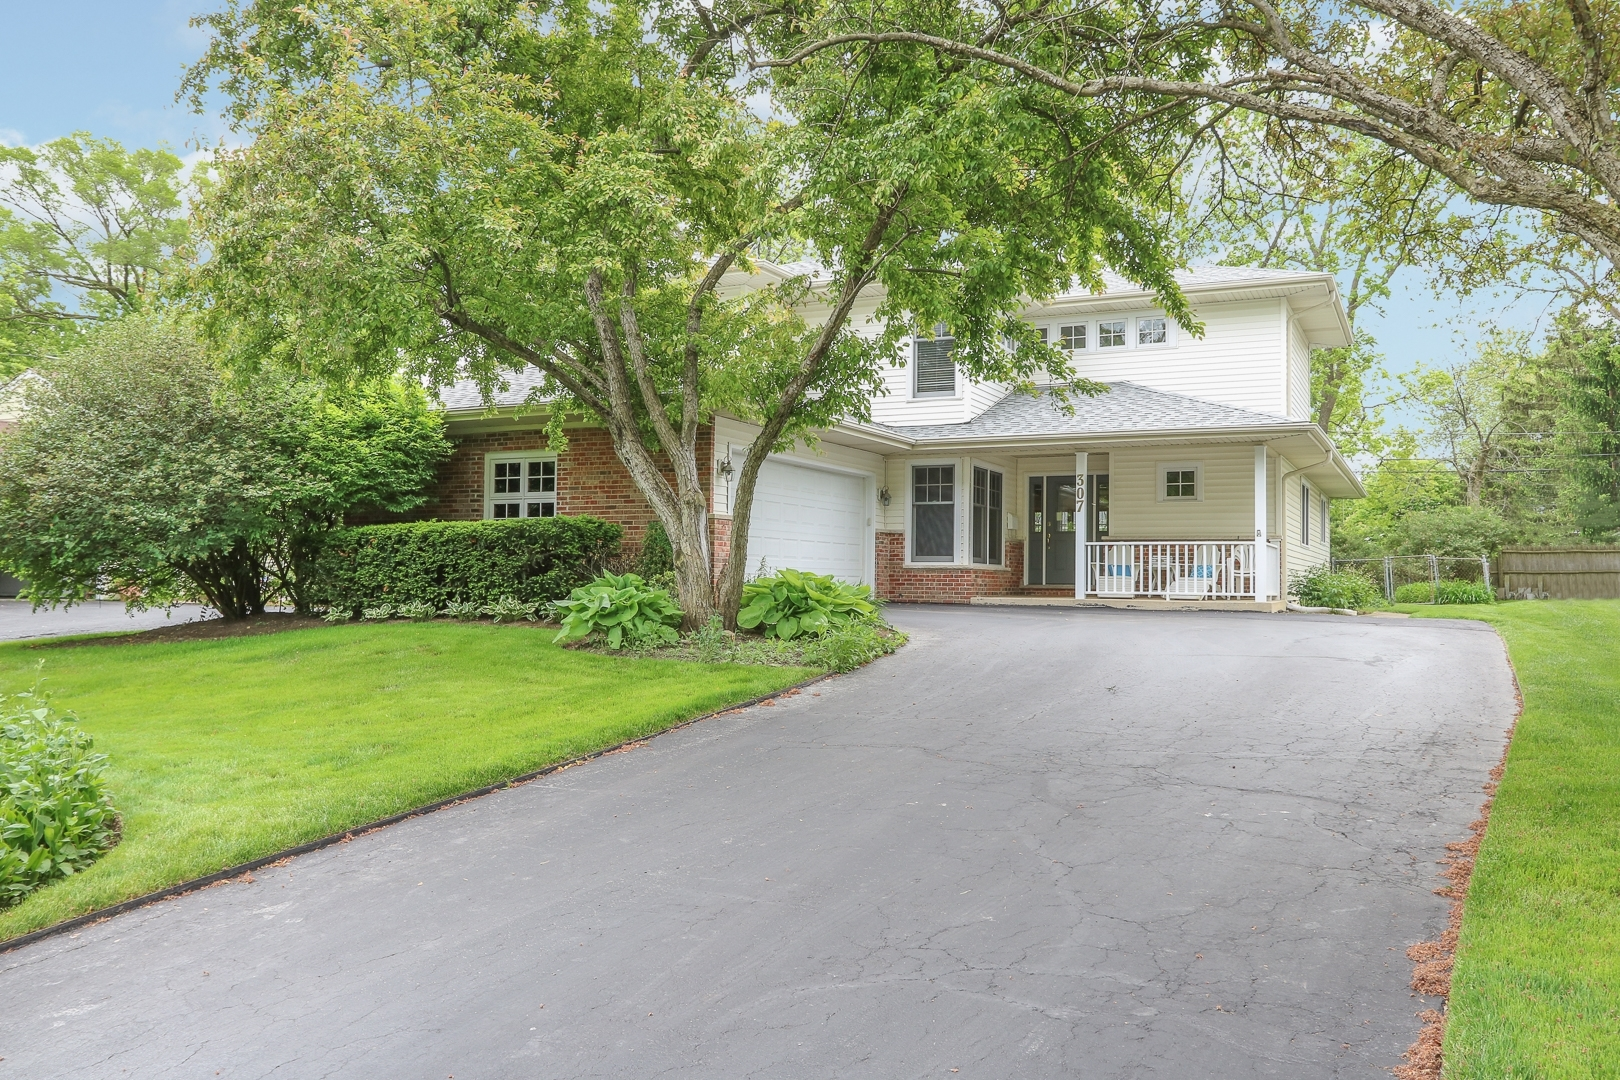 307 East Washington Avenue, Lake Bluff, Illinois 60044